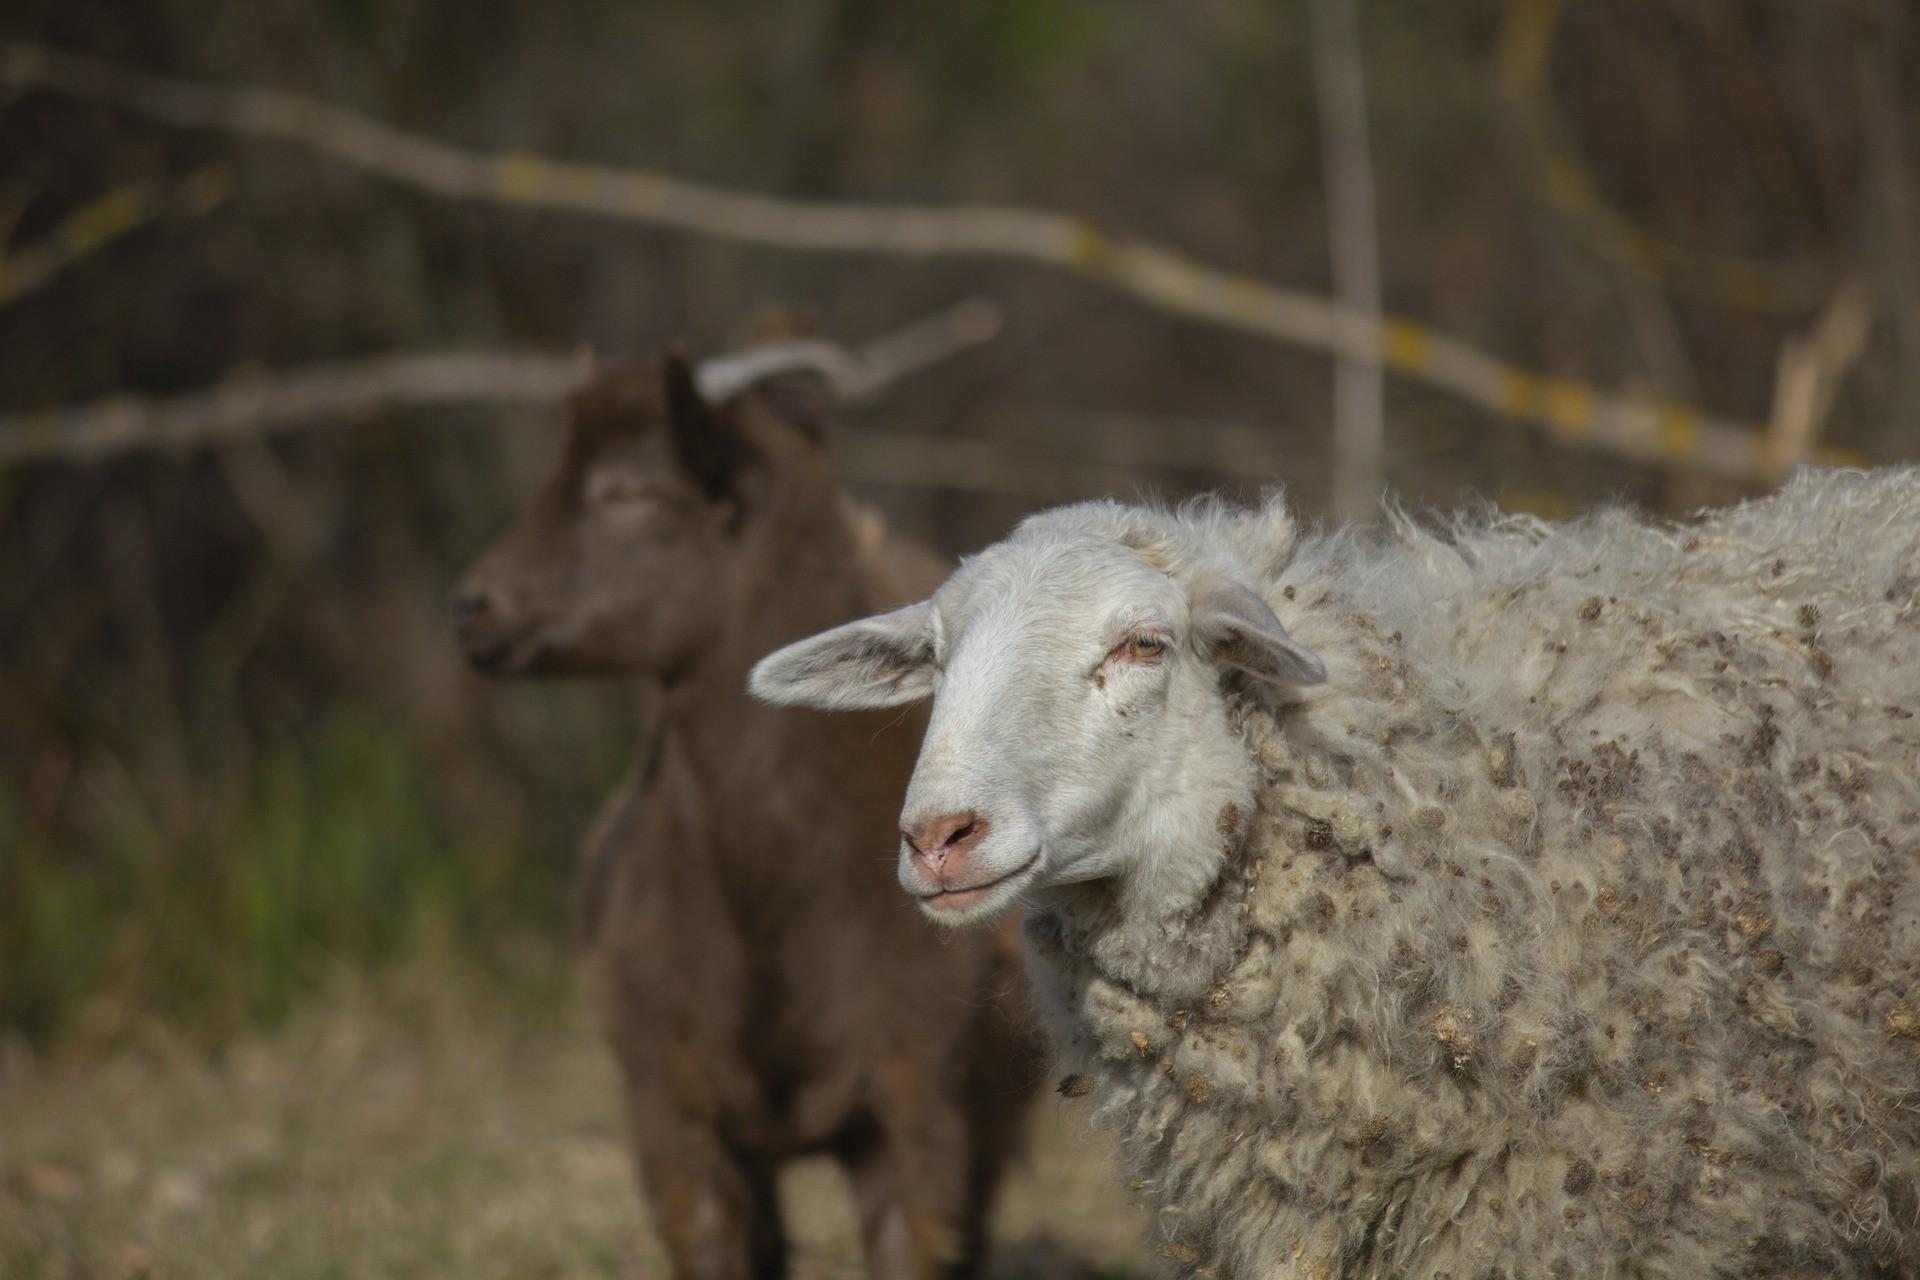 ovin caprin chèvre mouton